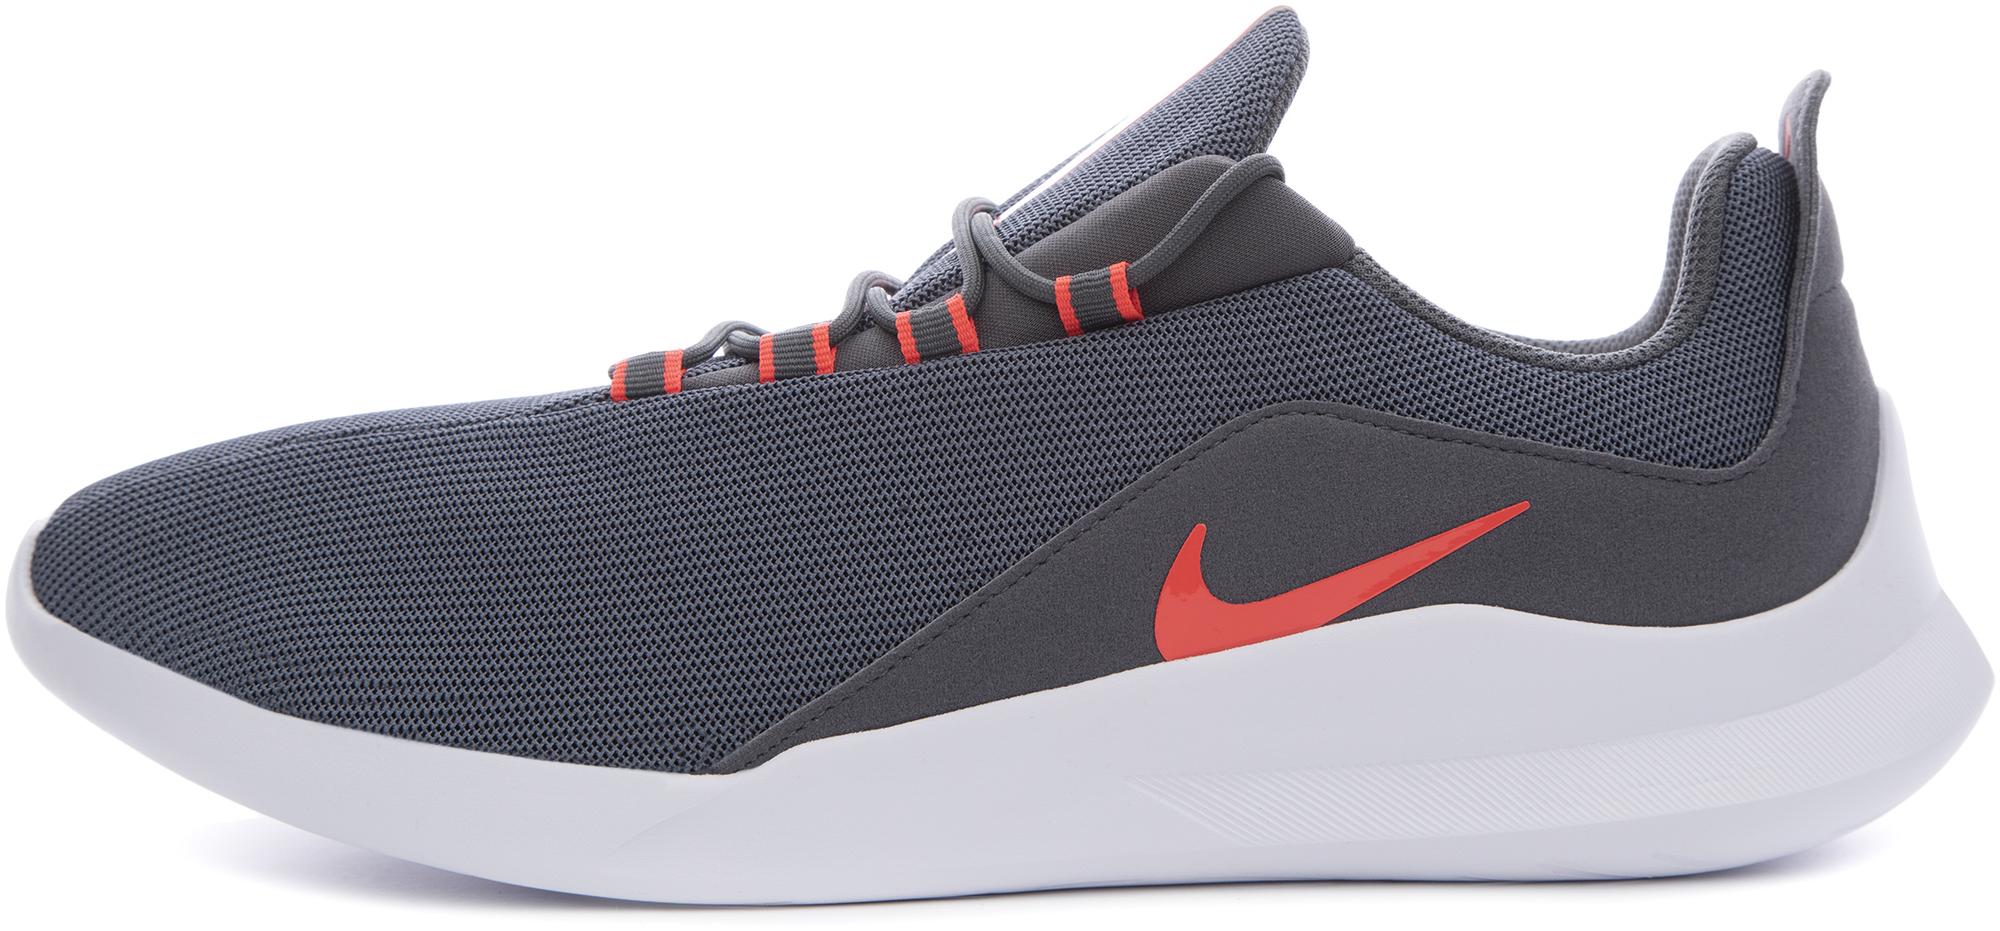 Nike Кроссовки мужские Viale, размер 42